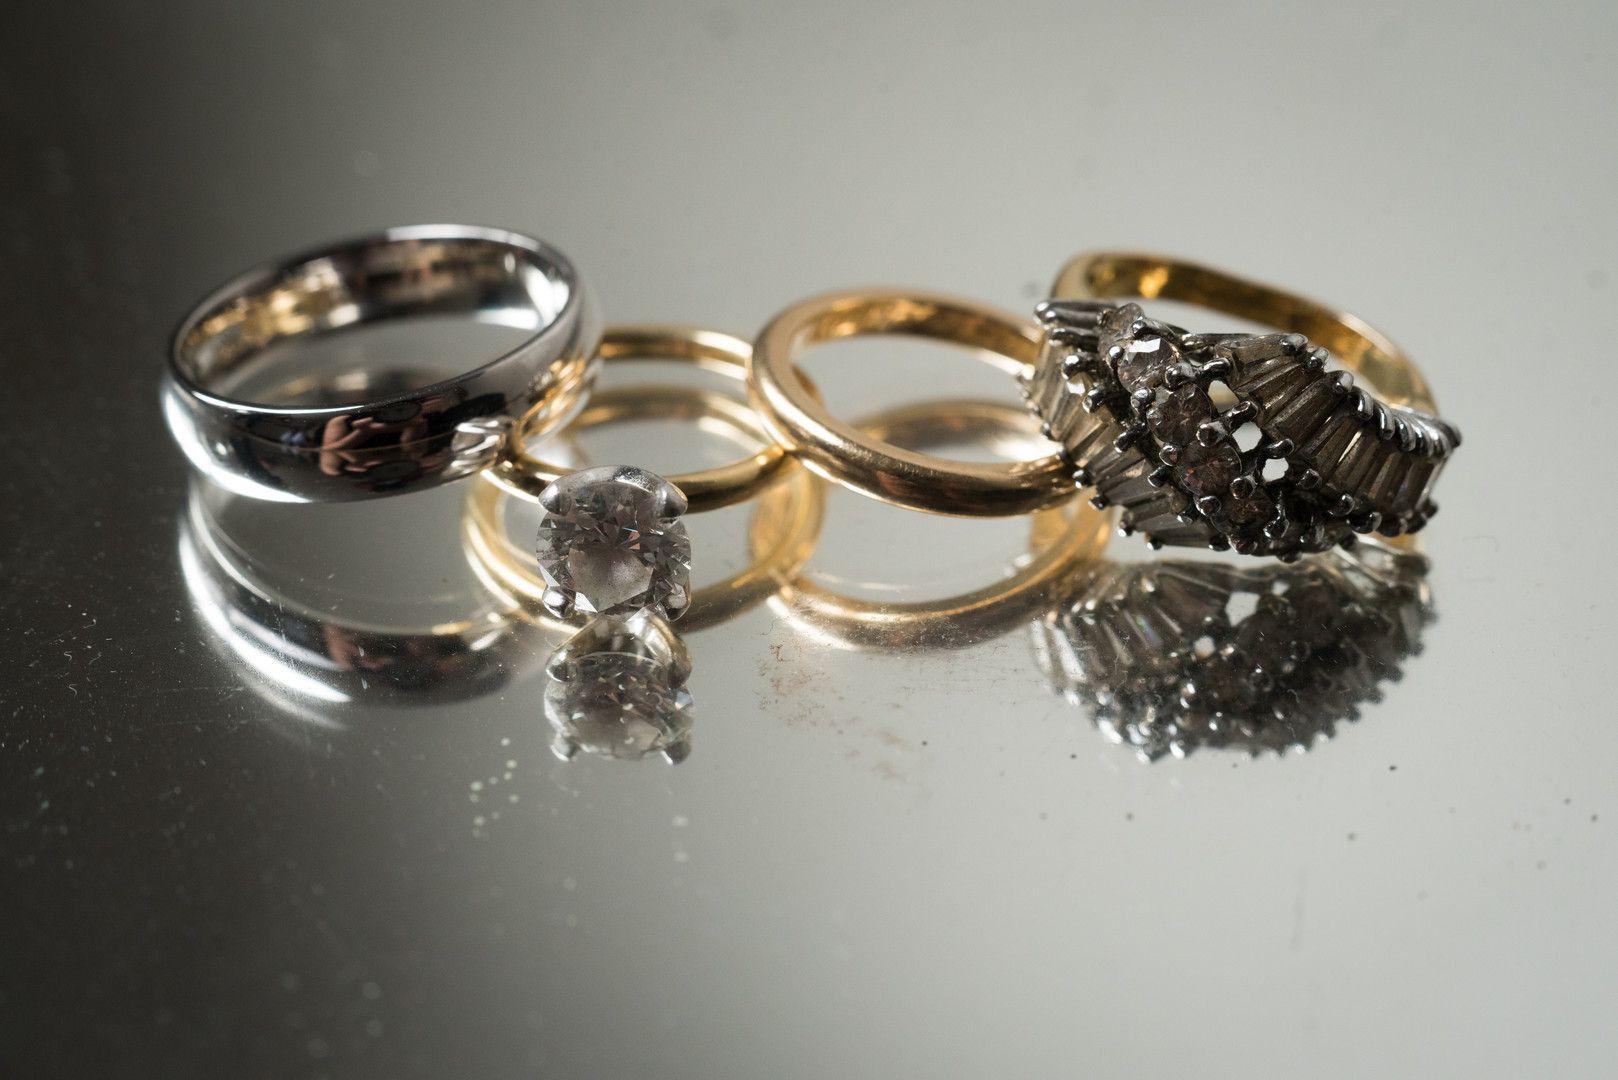 Diana Jon Moonlight Studios Wedding In Chicago Il Us Aislememories In 2020 Wedding Rings Engagement Engagement Ring Inspiration Diamond Wedding Rings